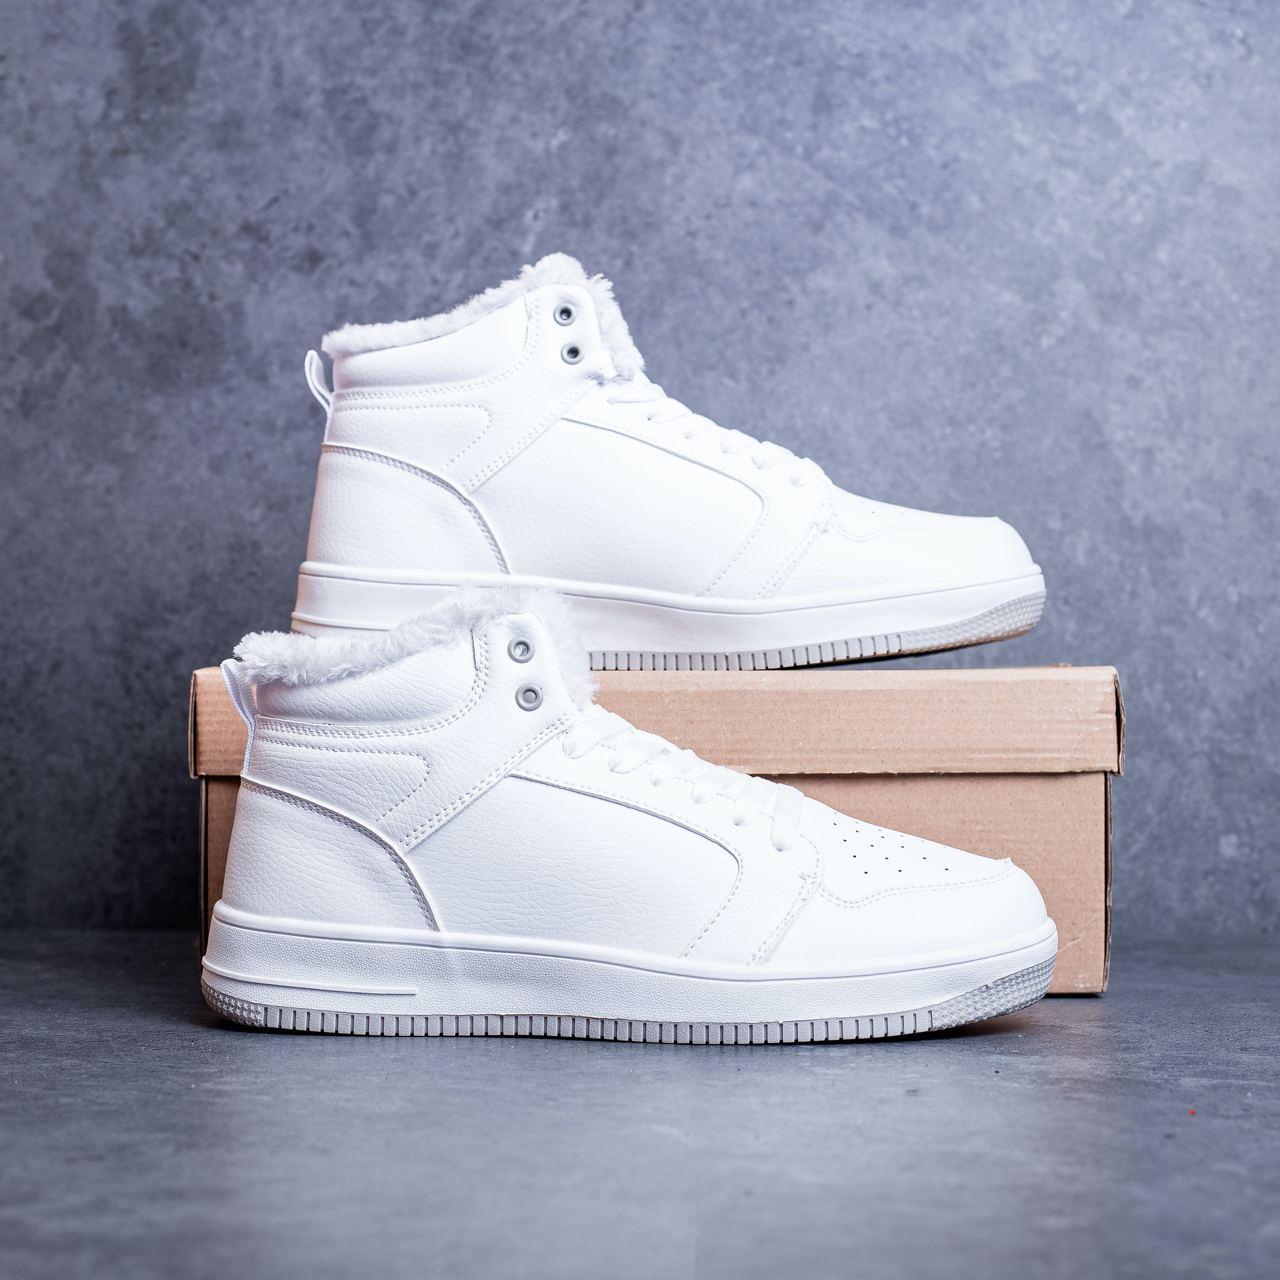 Мужские ботинки Стилли форс хай Pobedov (белые)